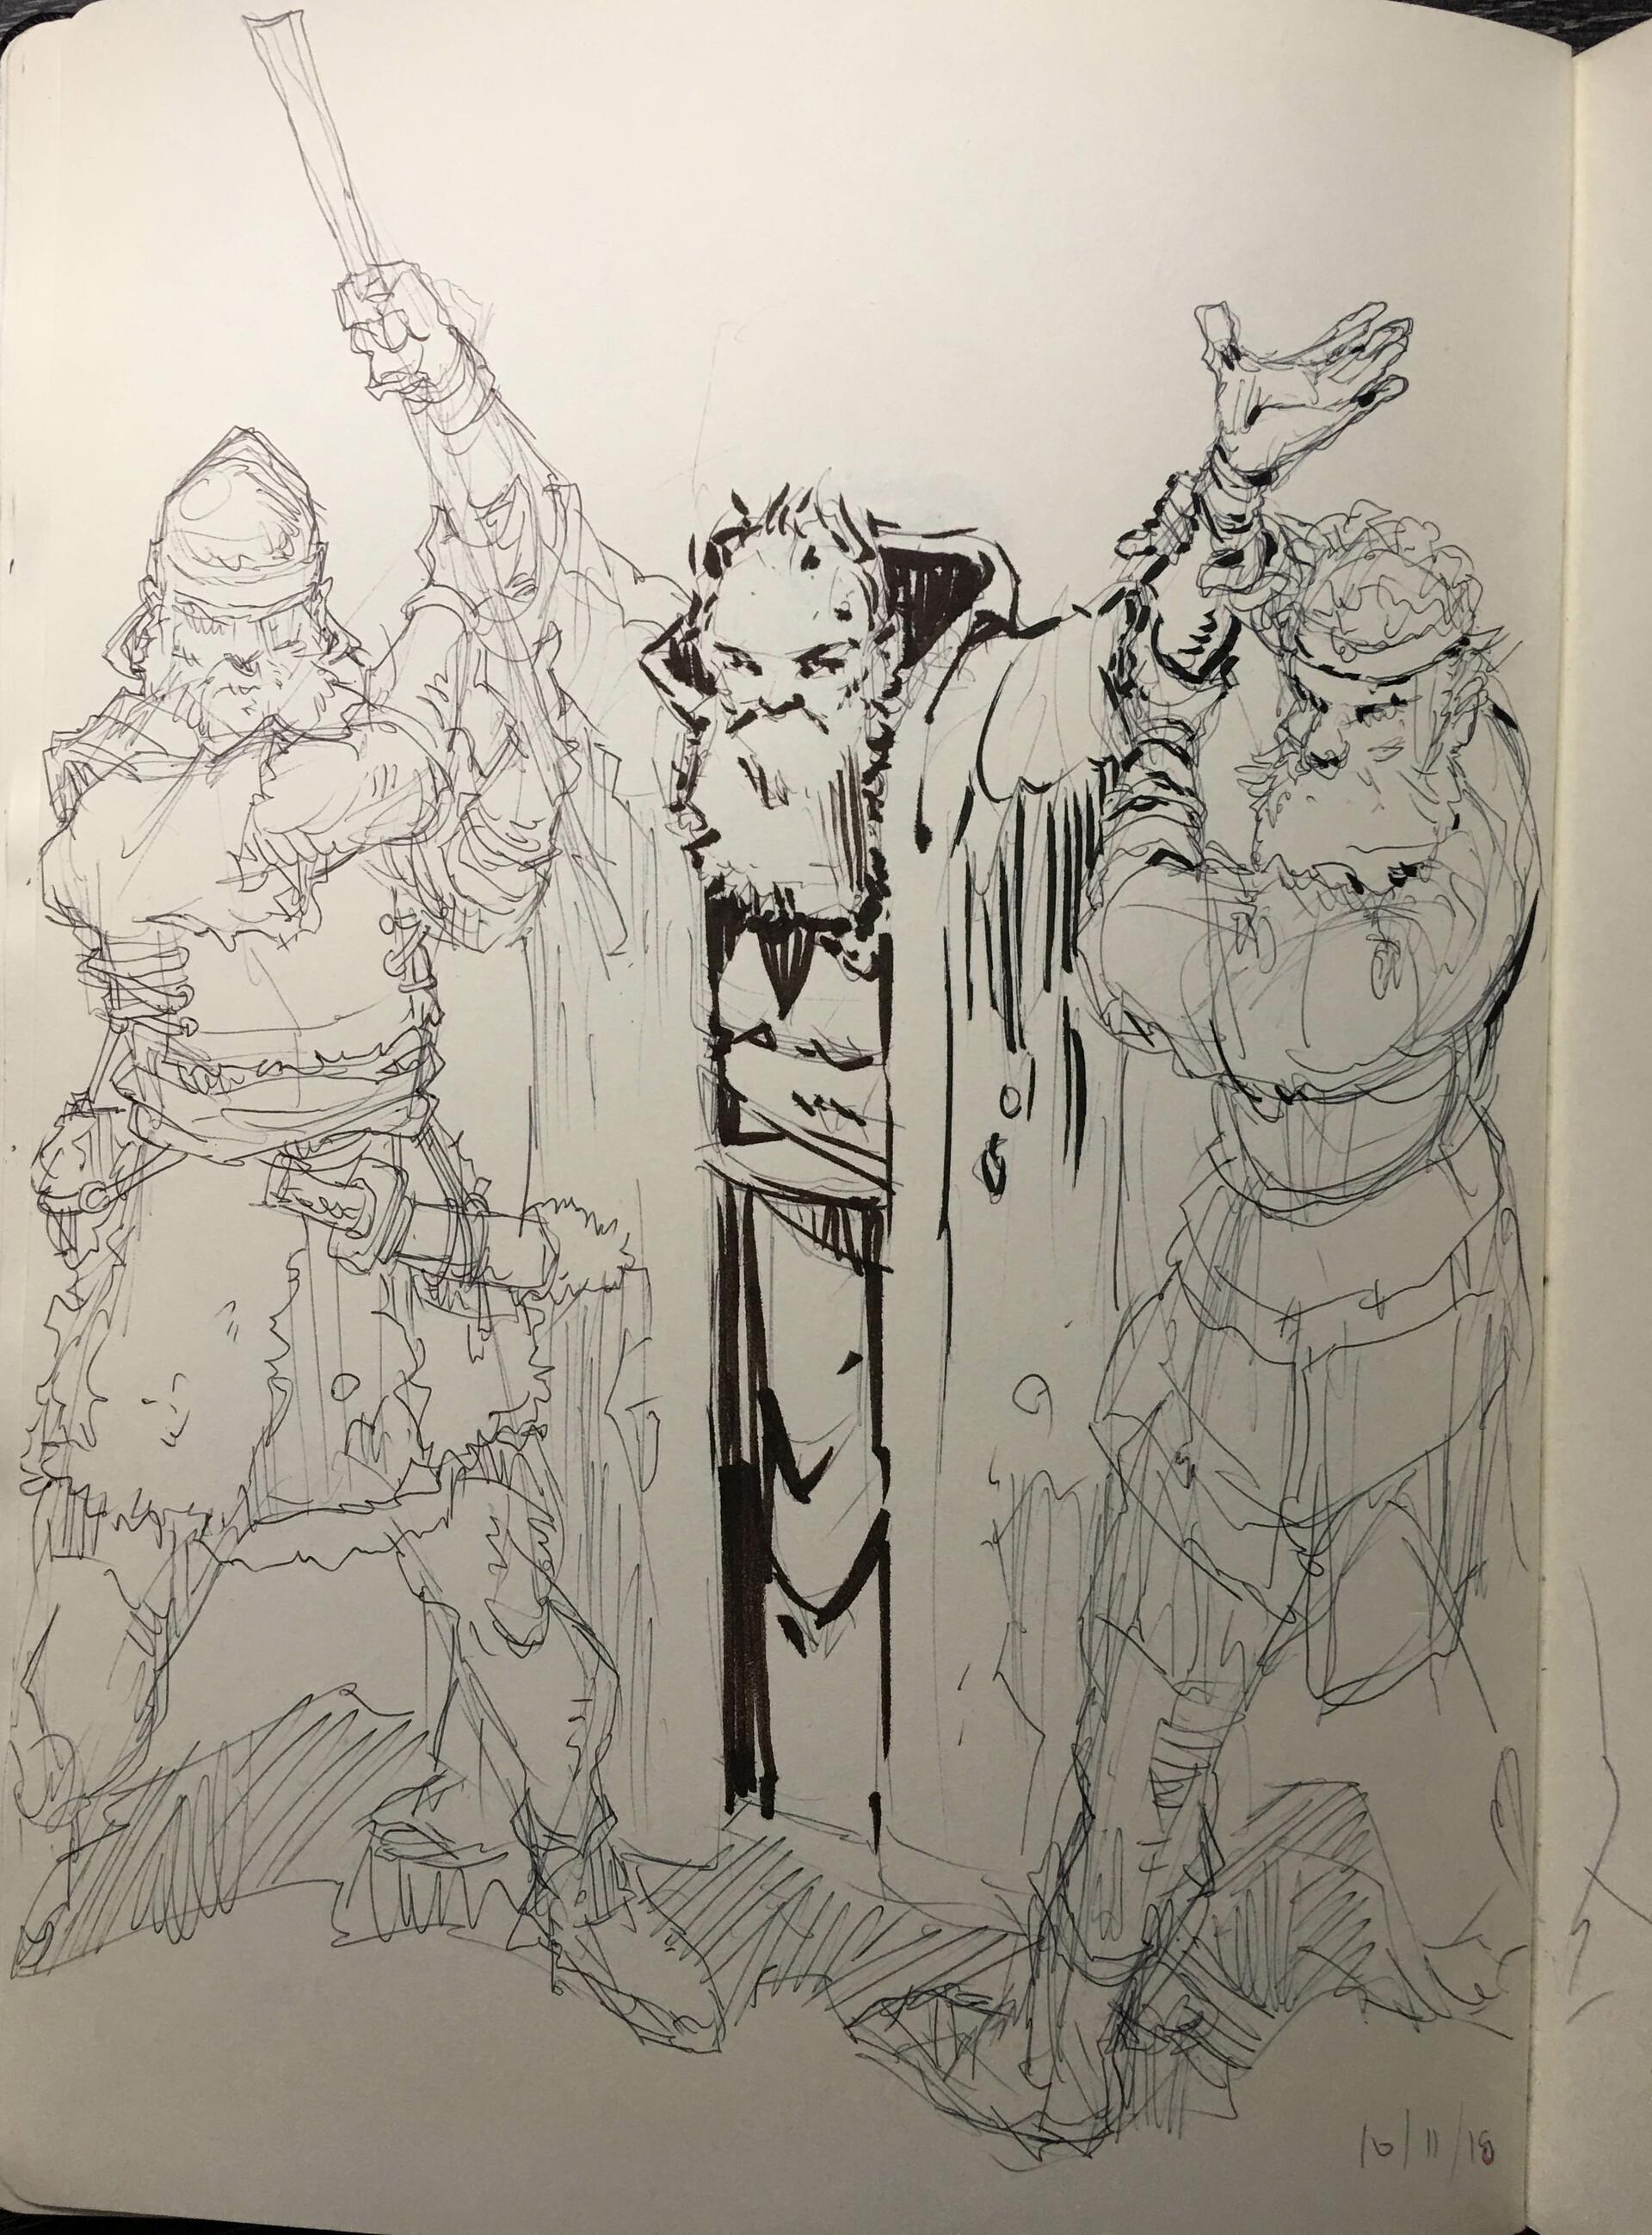 Original ballpoint pen and ink sketch.